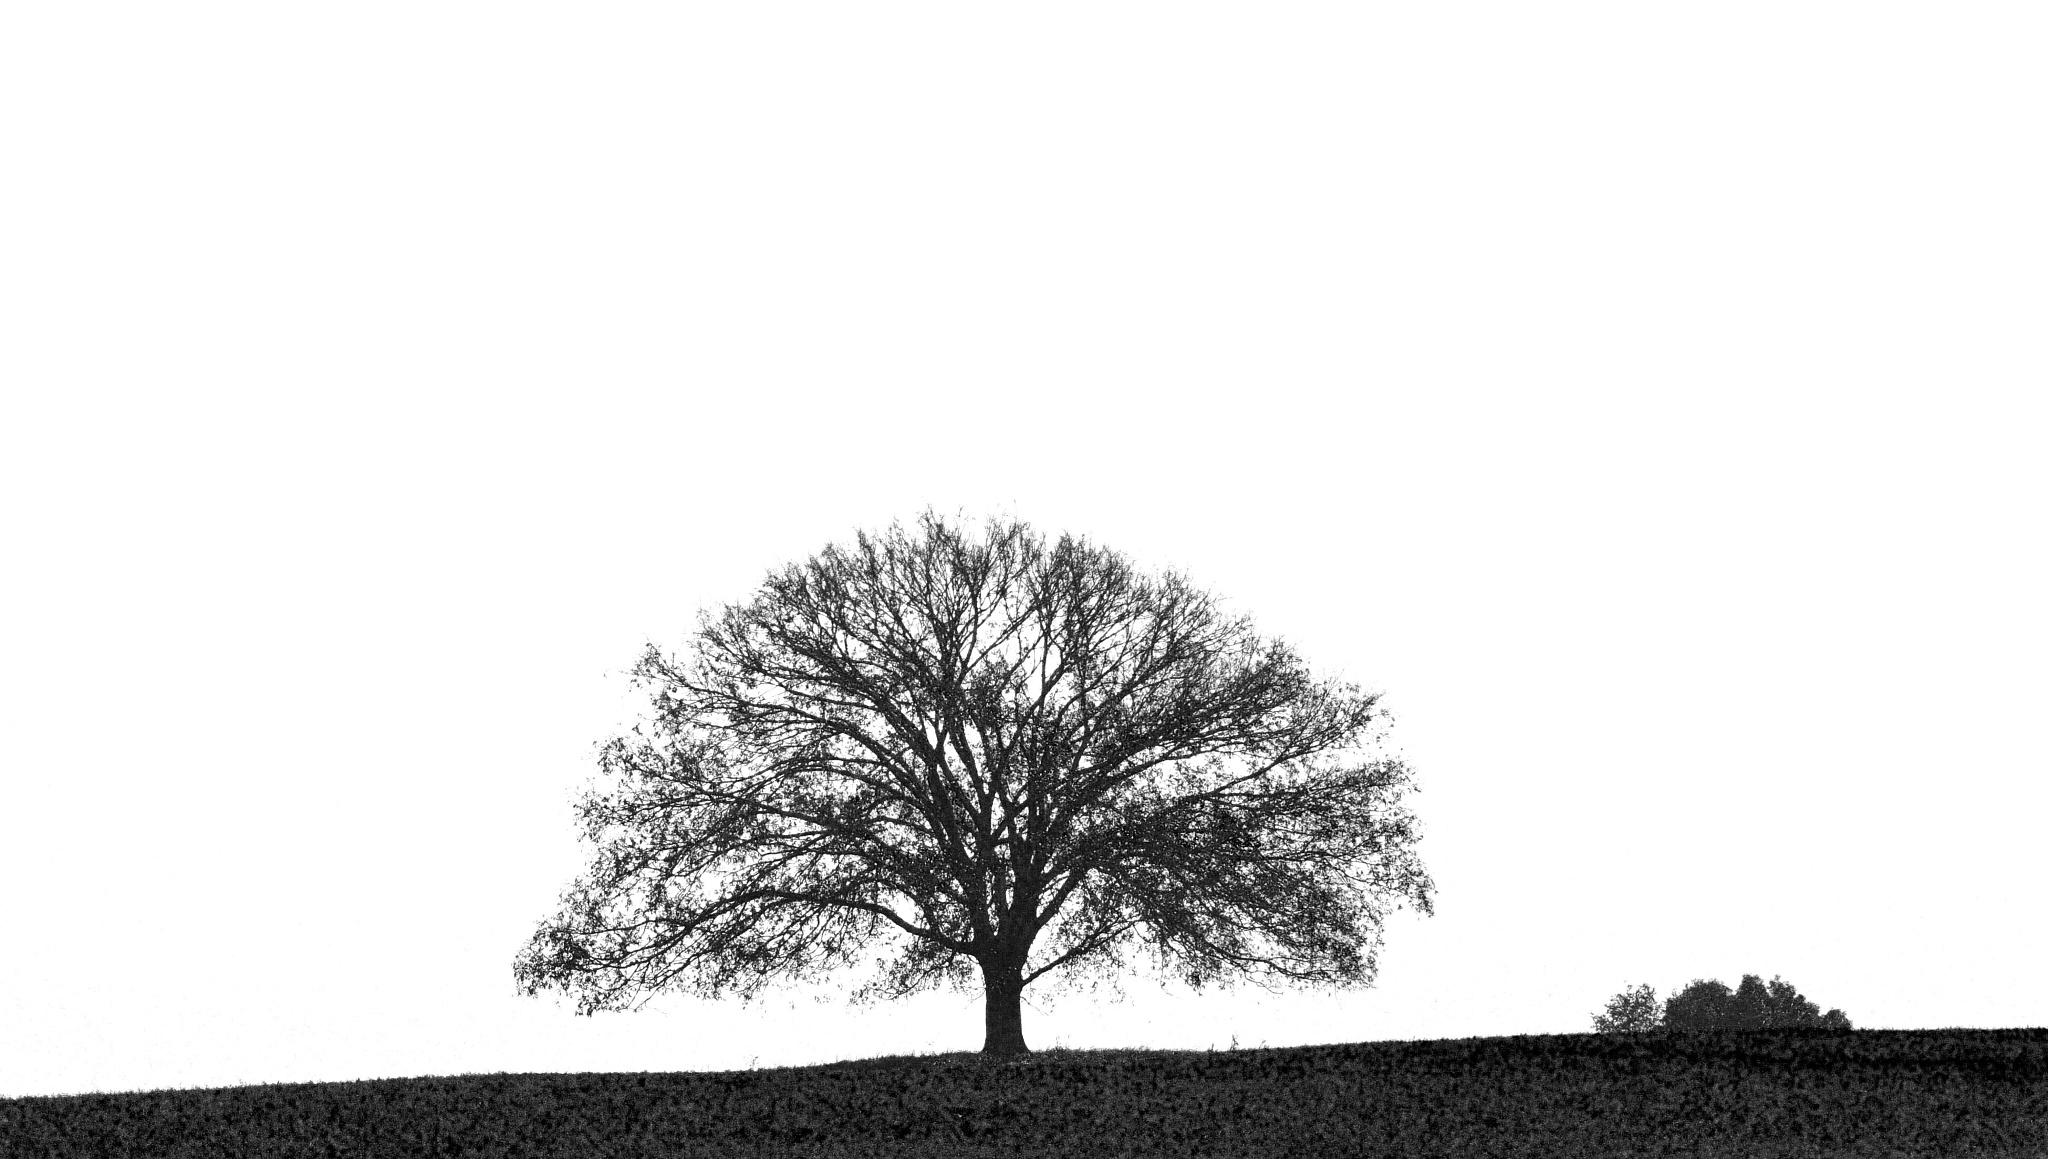 B/W tree by Robert Hayes